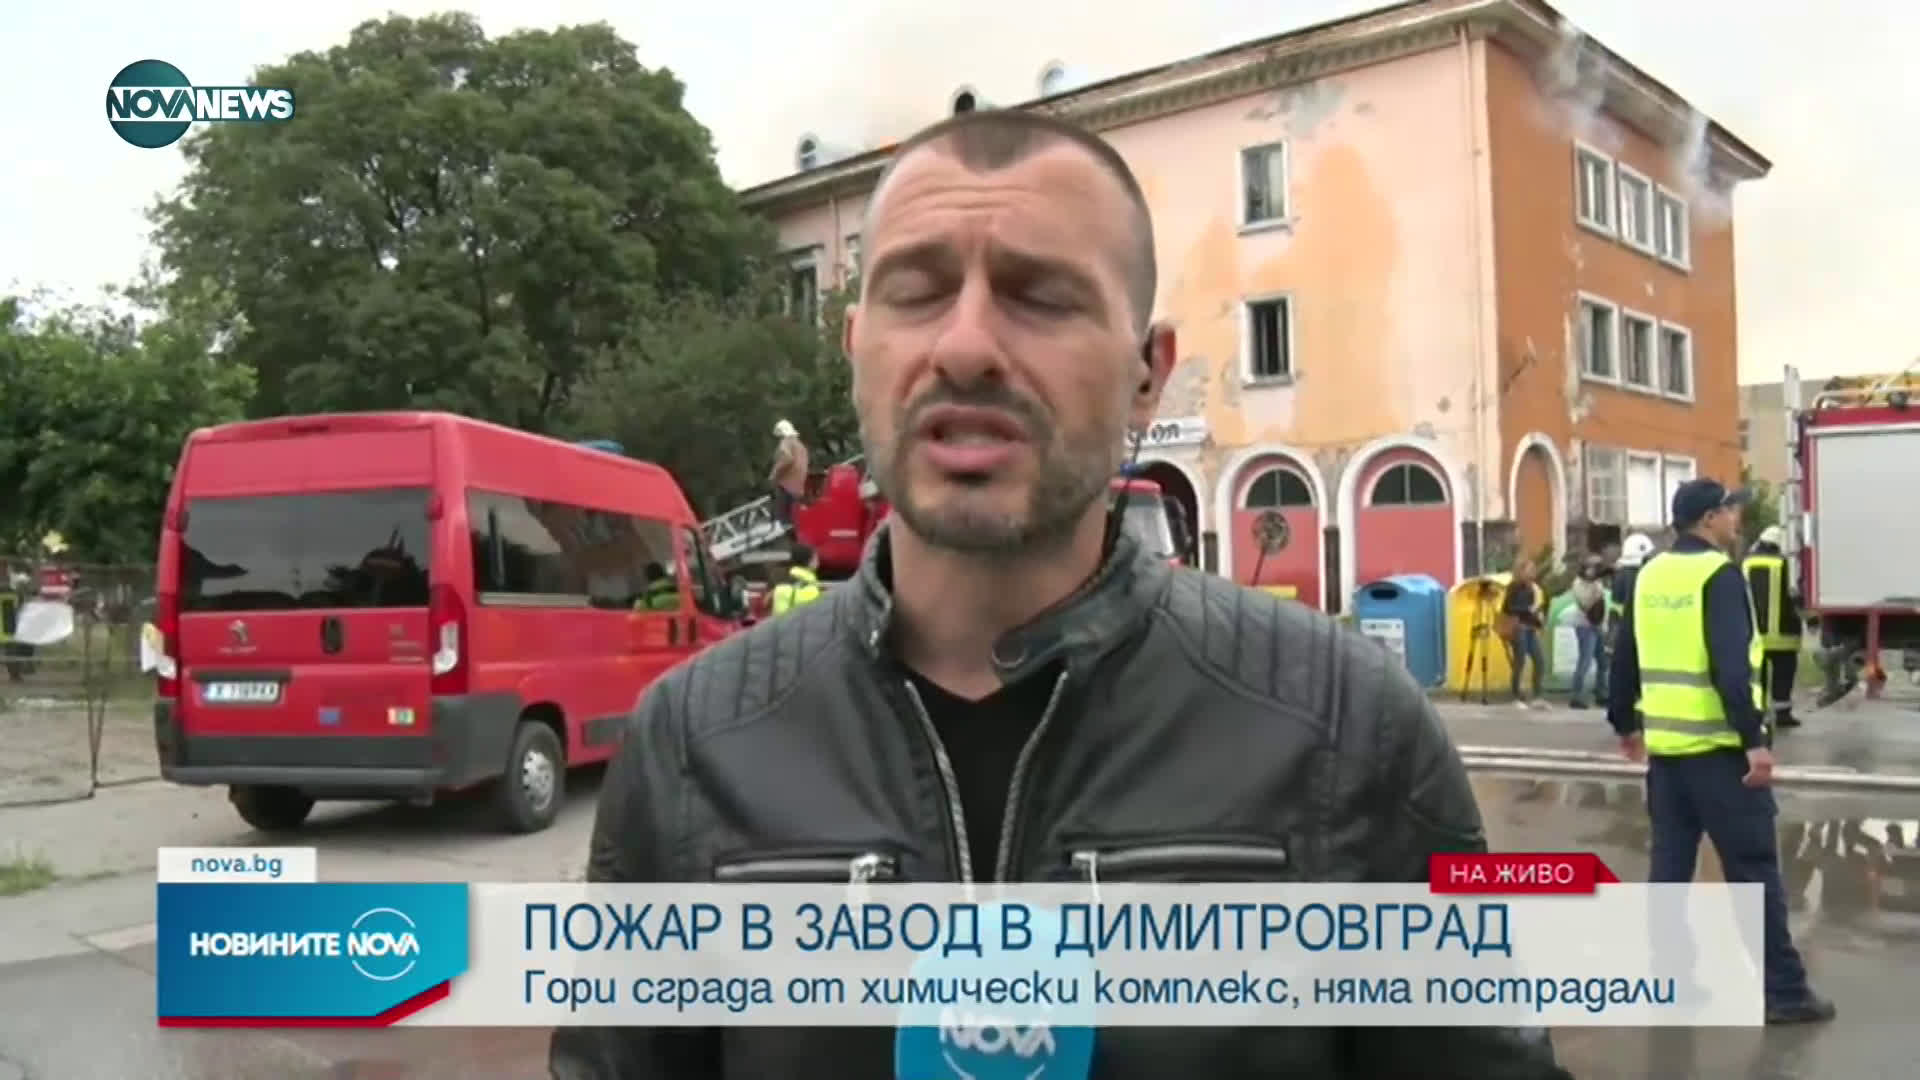 Пожар в завод в Димитровград